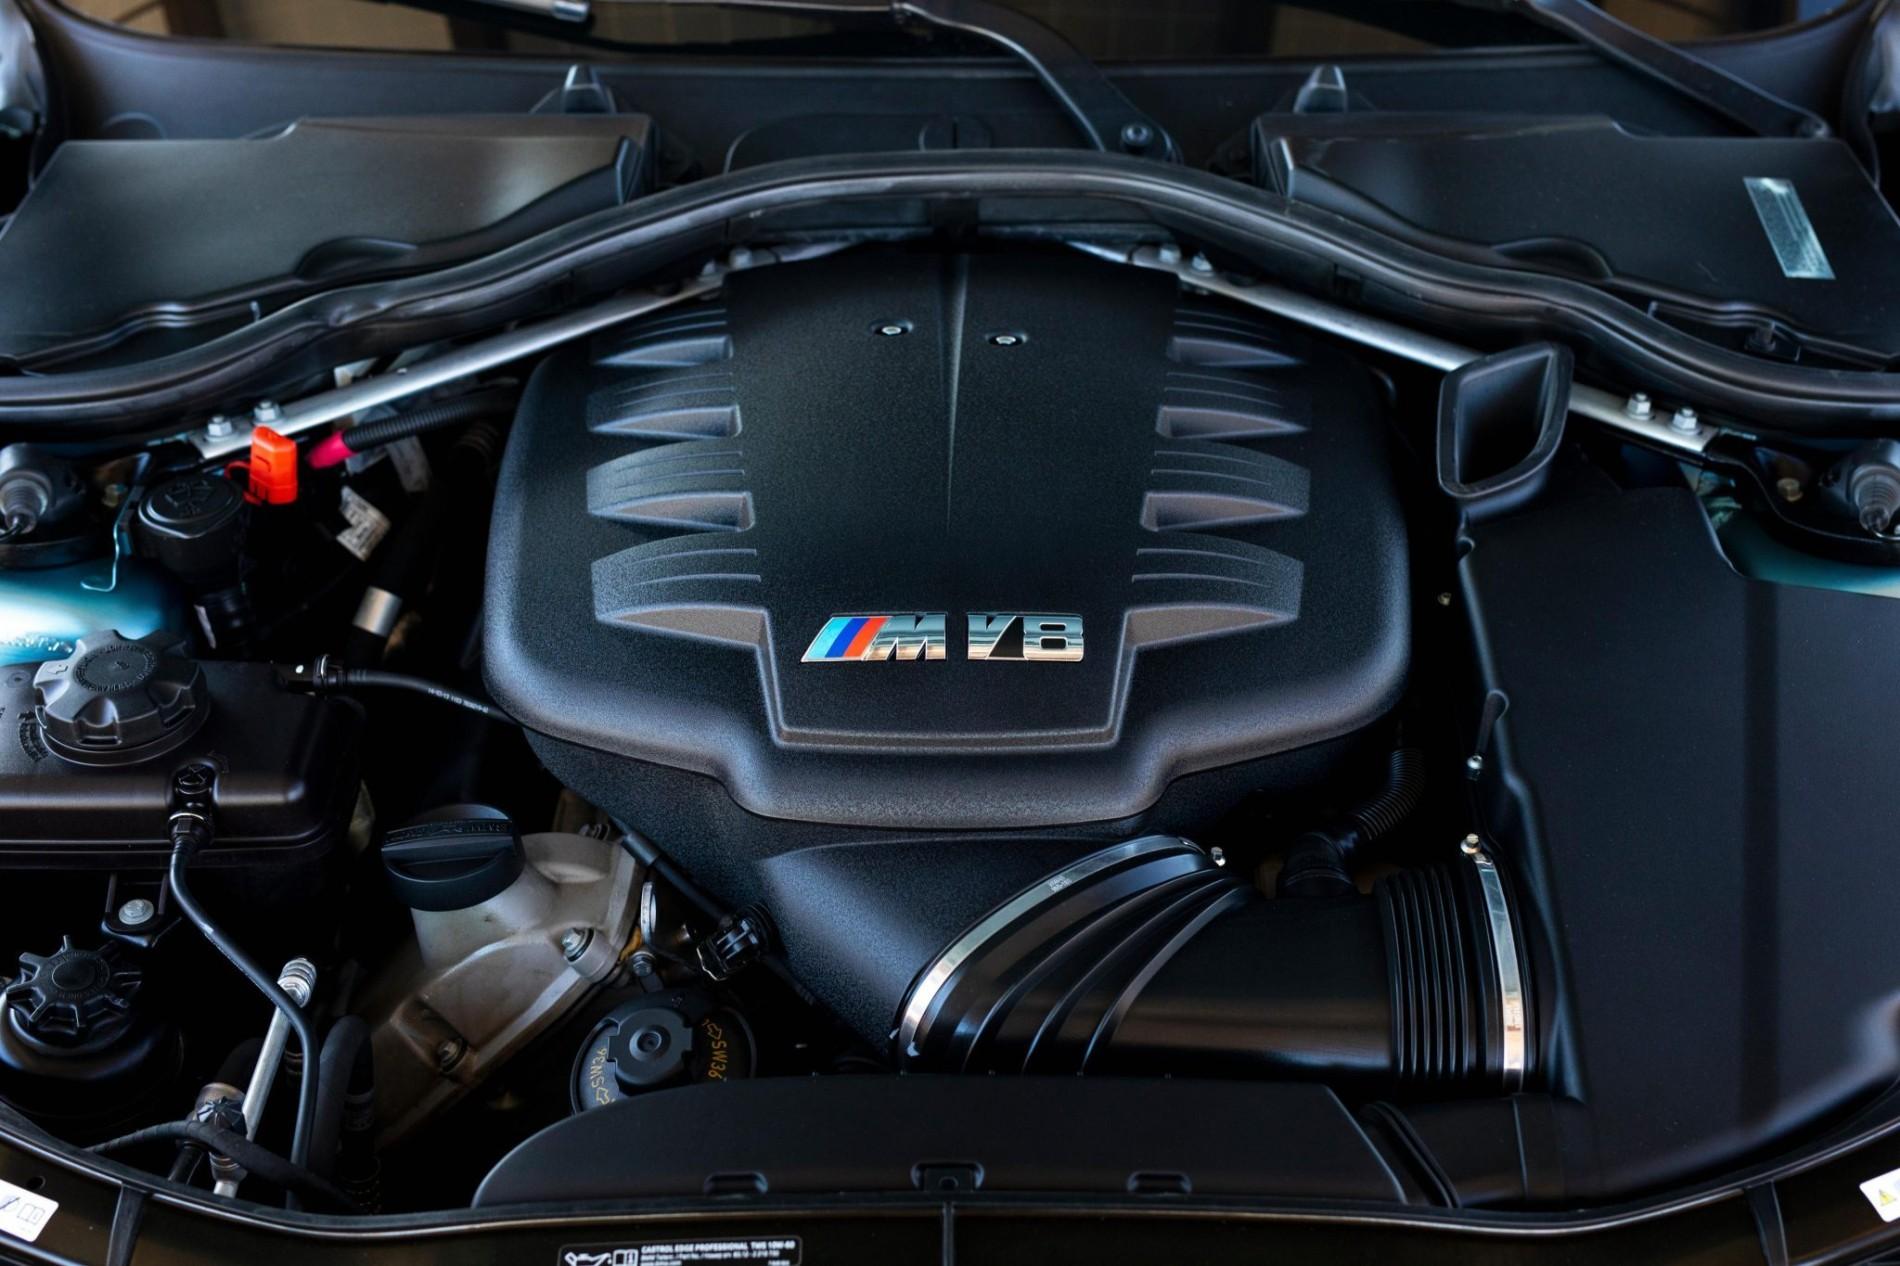 BMW M3 in Atlantic Blue - BMW M3 in Atlantic Blue